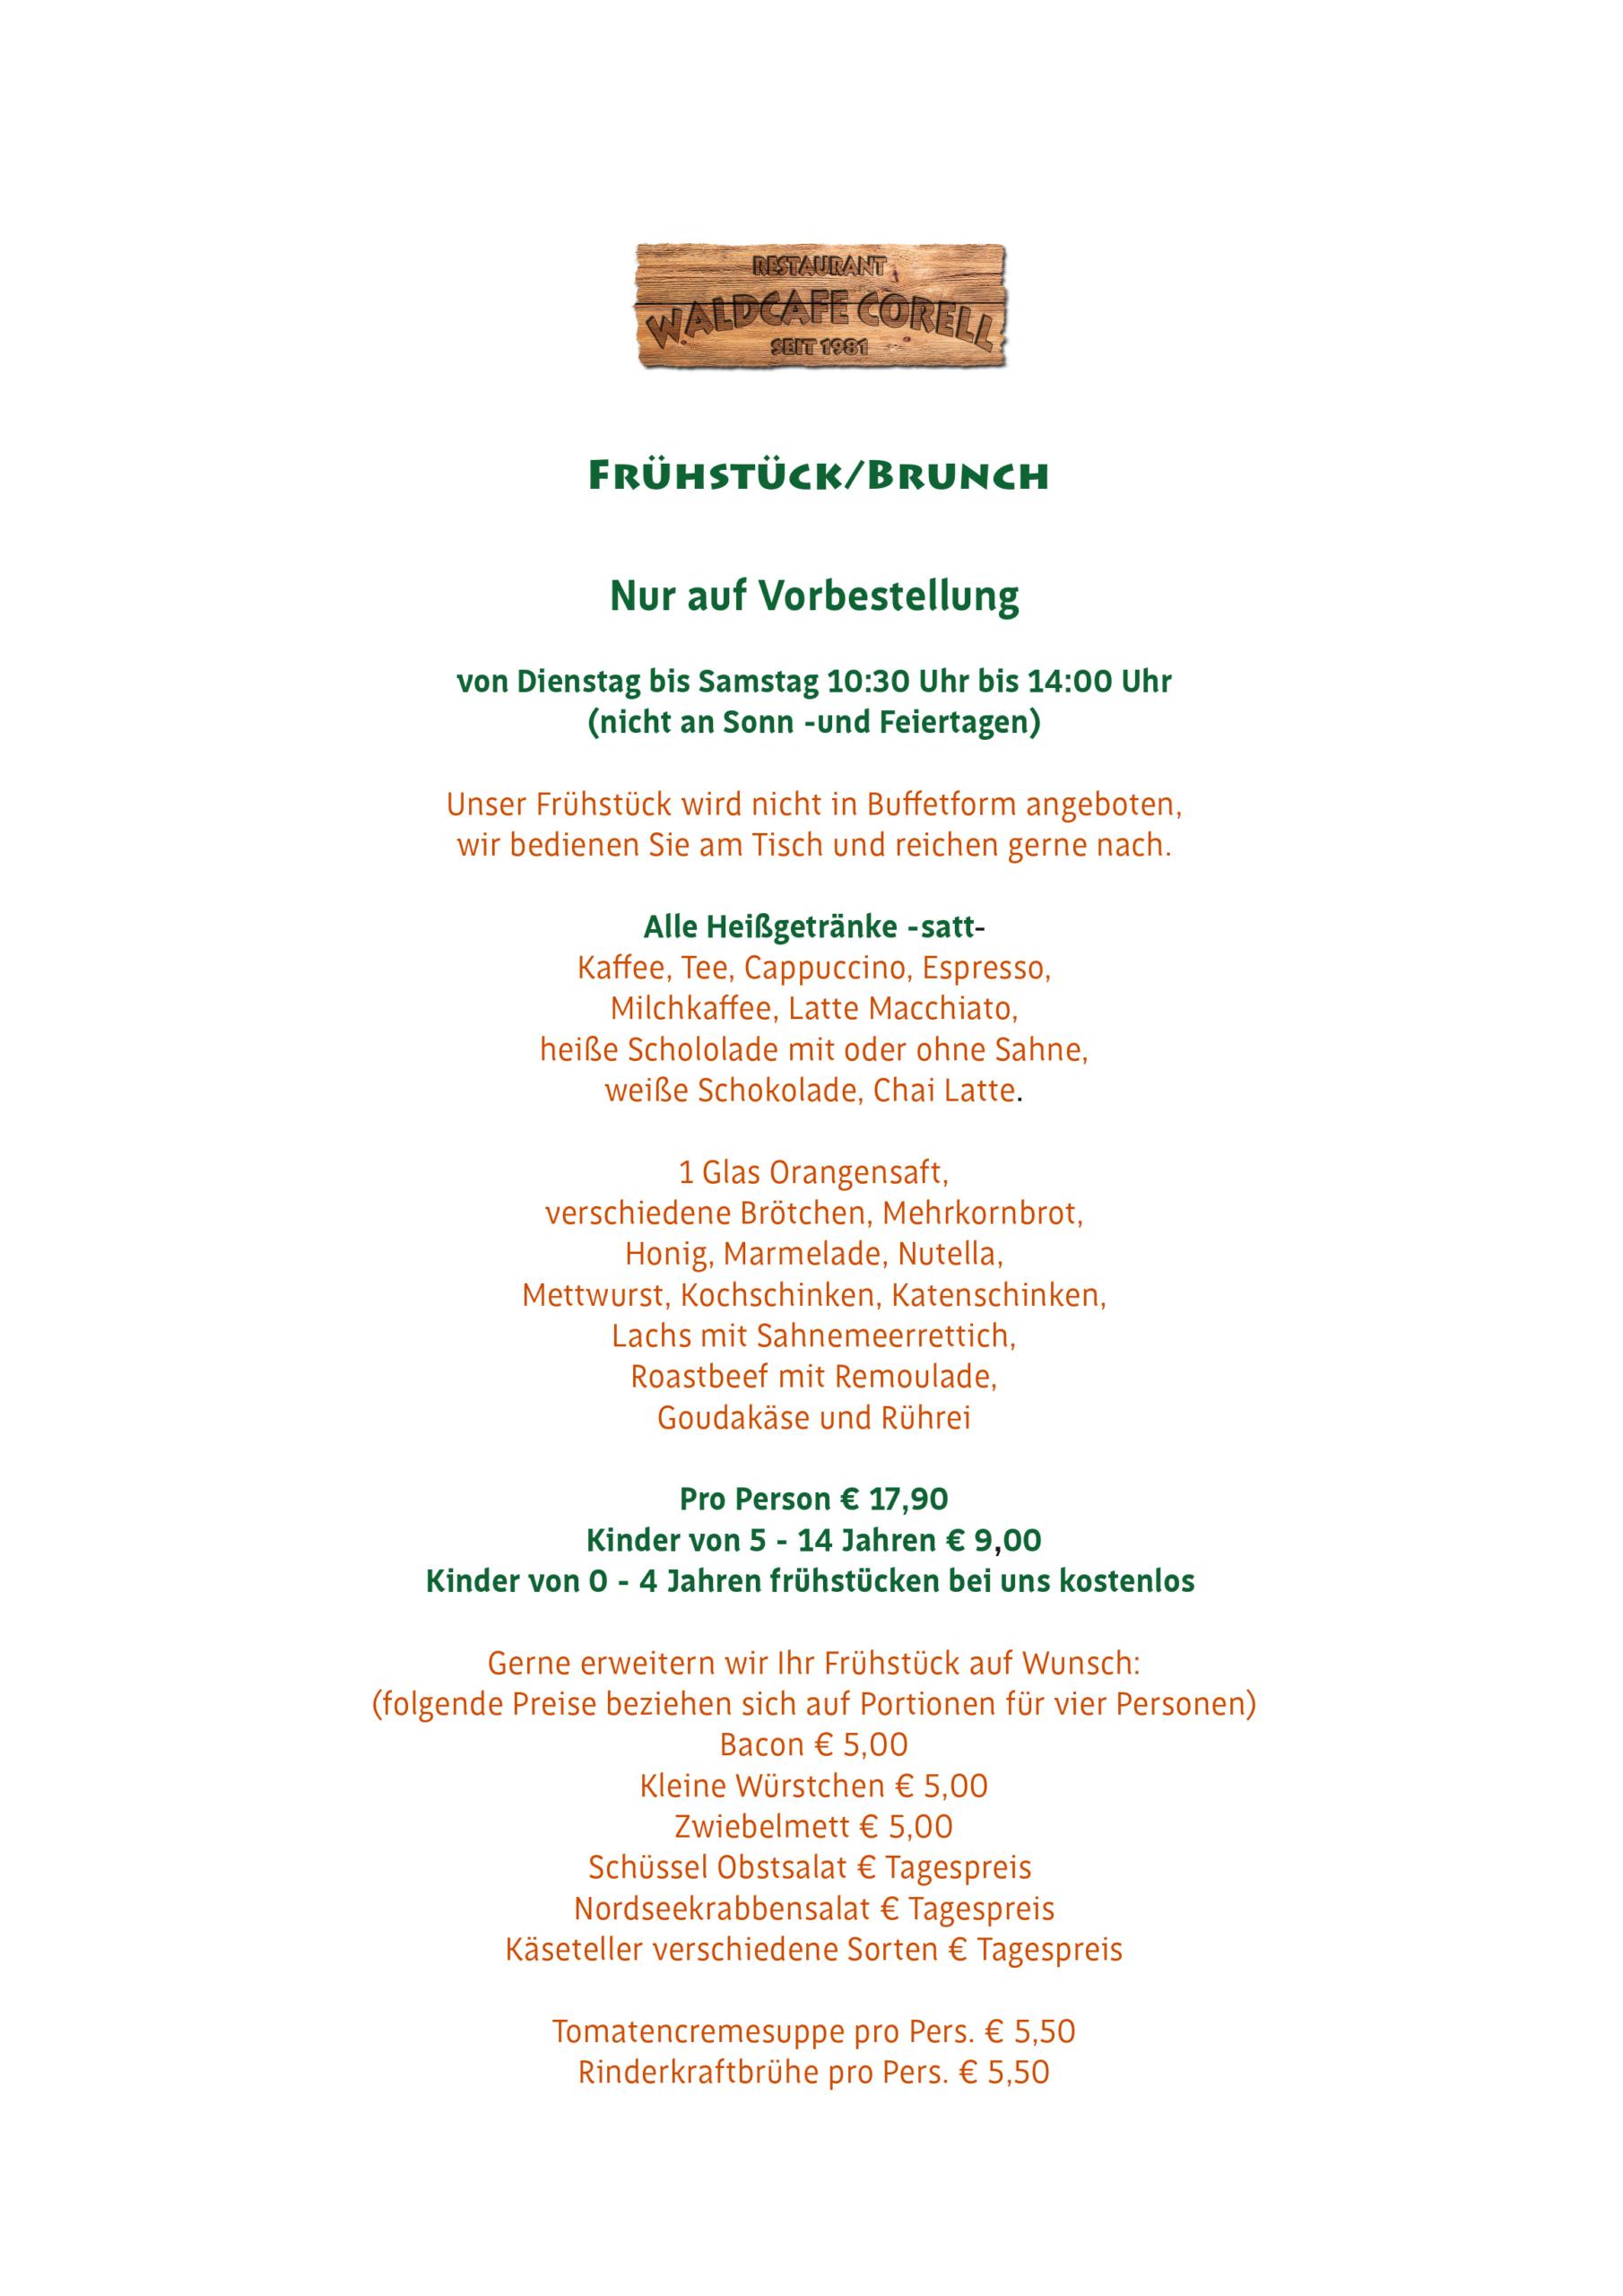 Waldcafe Corell, Speisekarte, Frühstück, Brunch